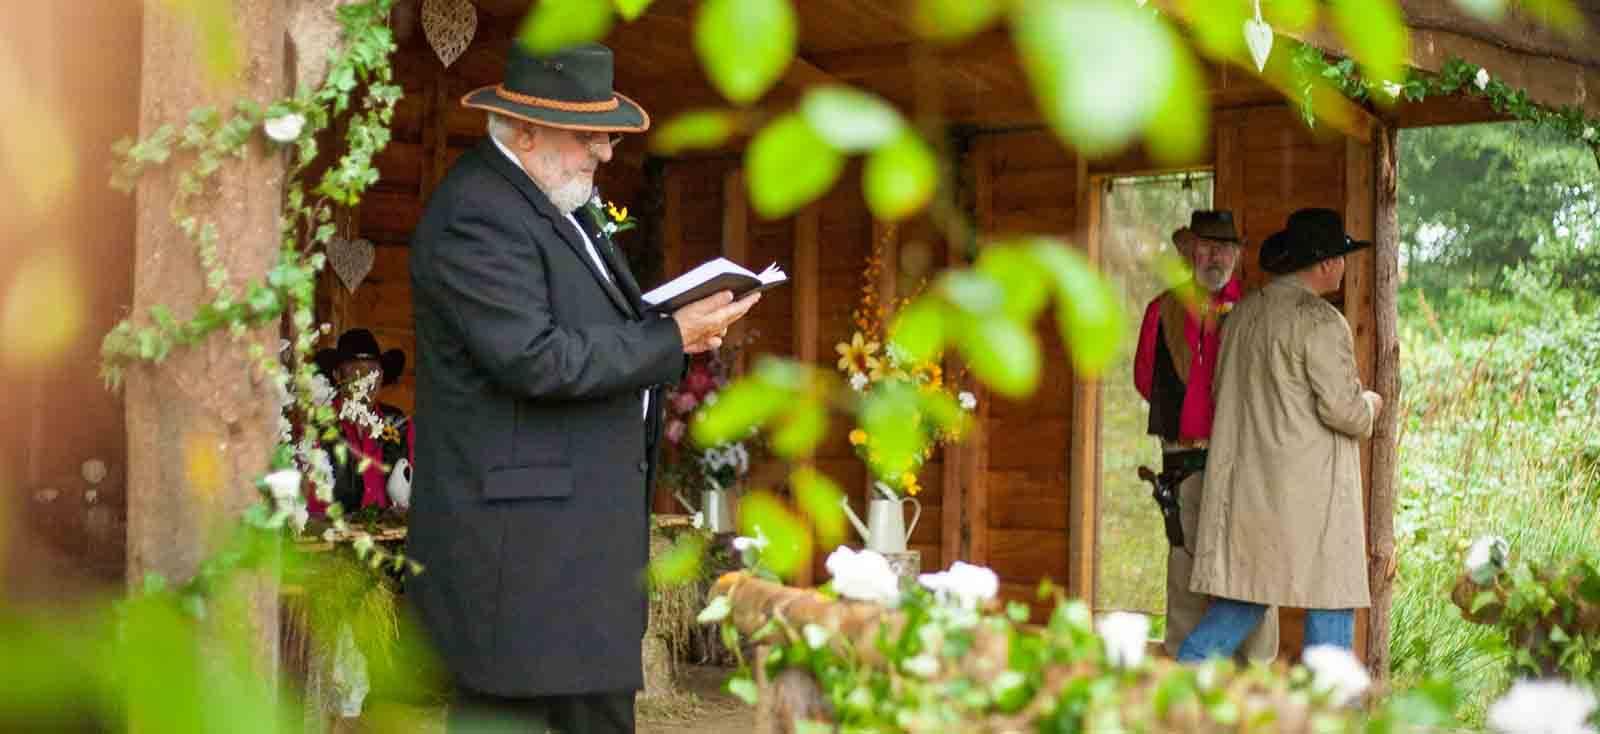 wedding celebrant at wedding pavilion